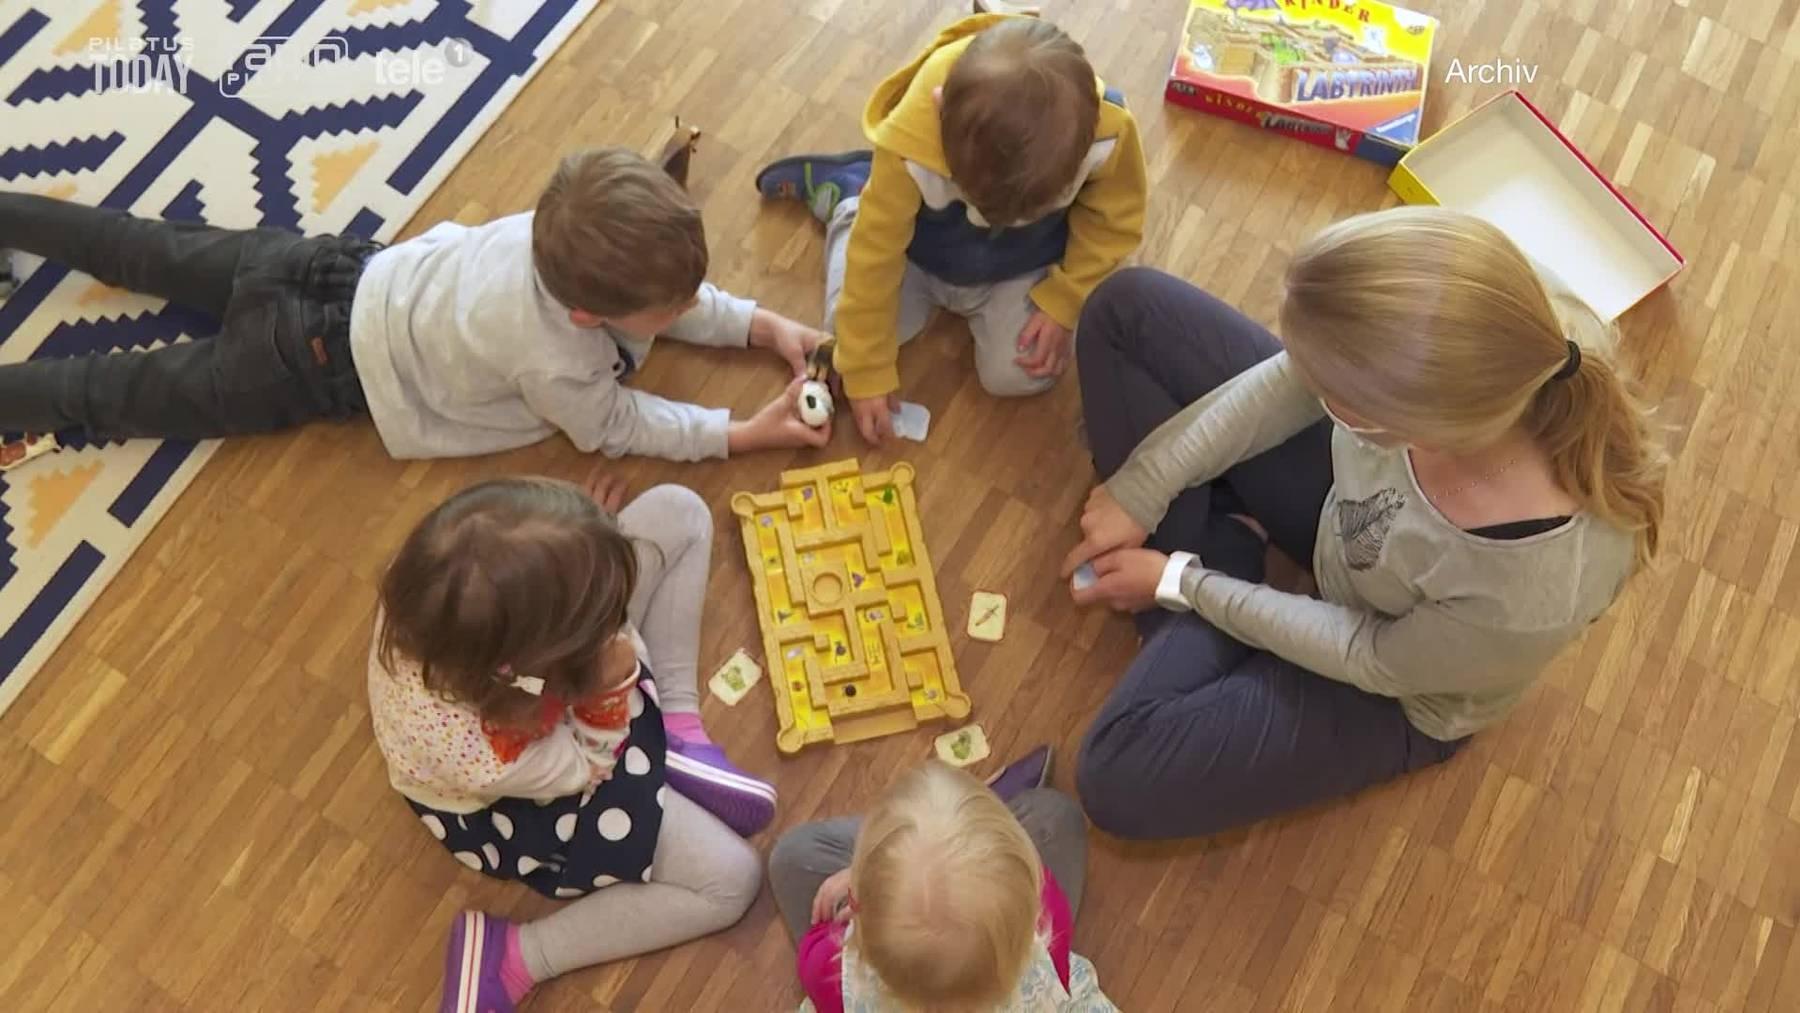 Thumb for ‹210525_N_BER_Luzern will bessere Kinderbetreuung›